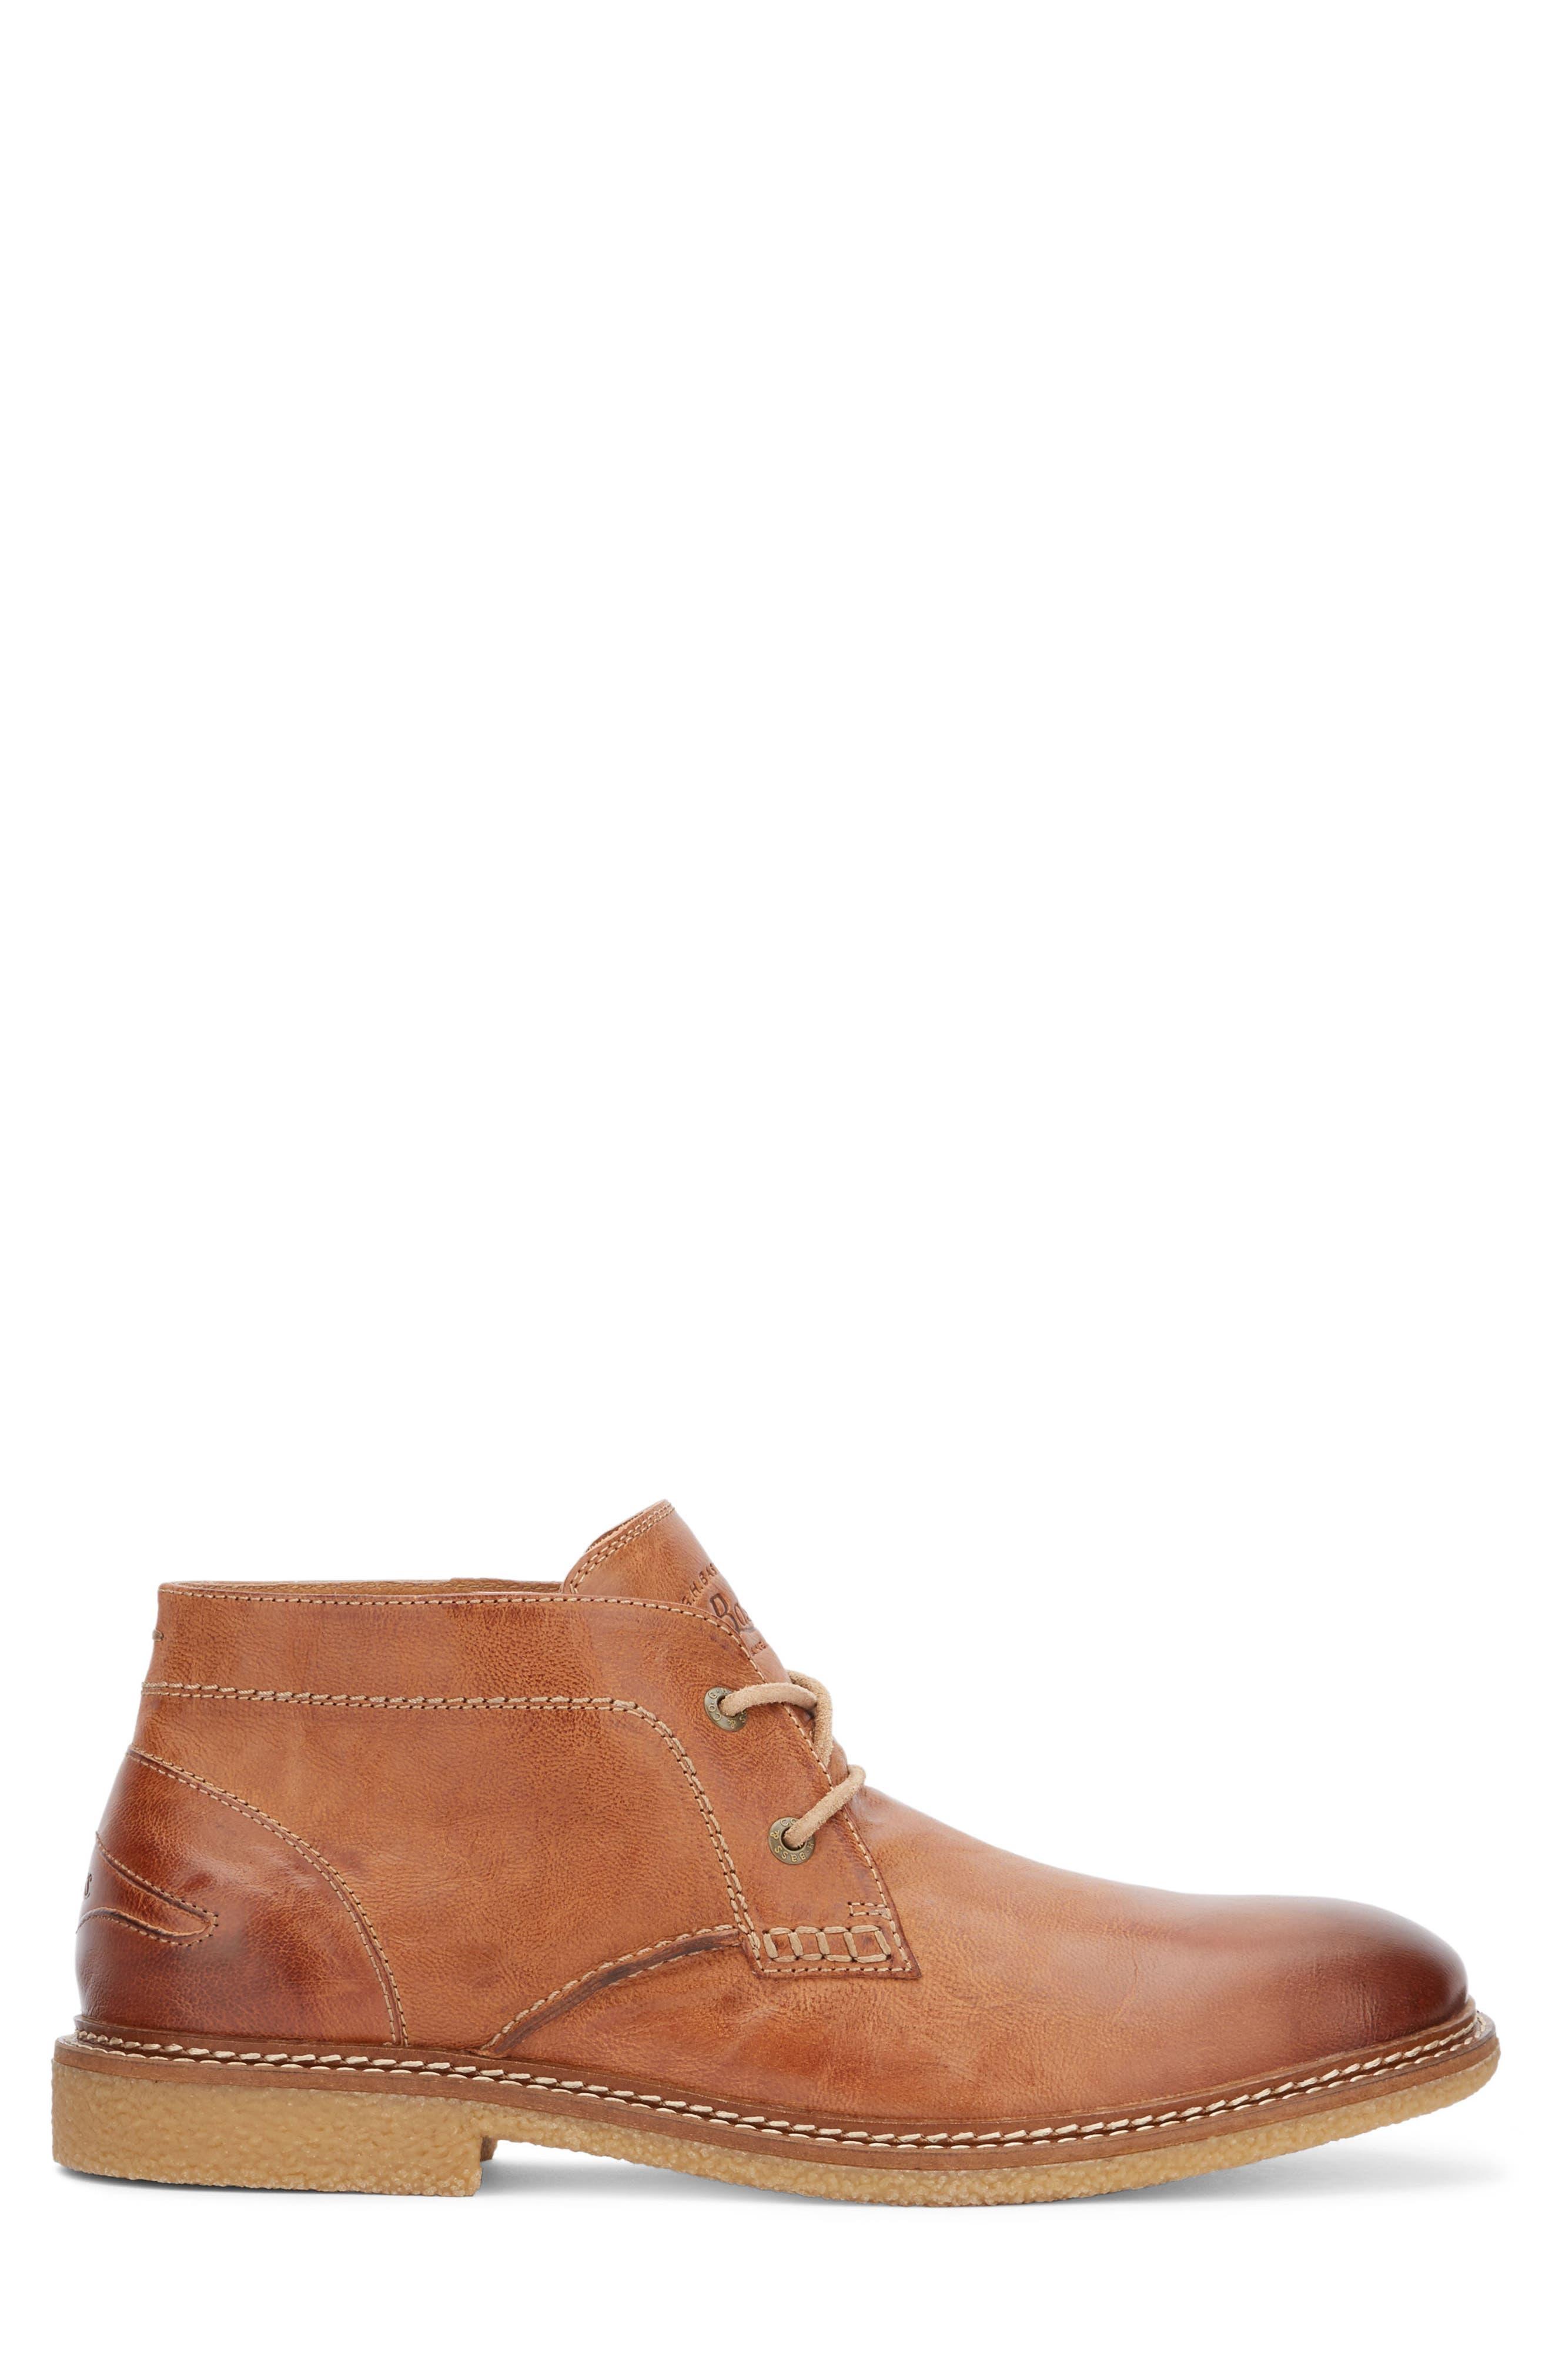 'Bennett' Chukka Boot,                             Alternate thumbnail 3, color,                             Tan Leather